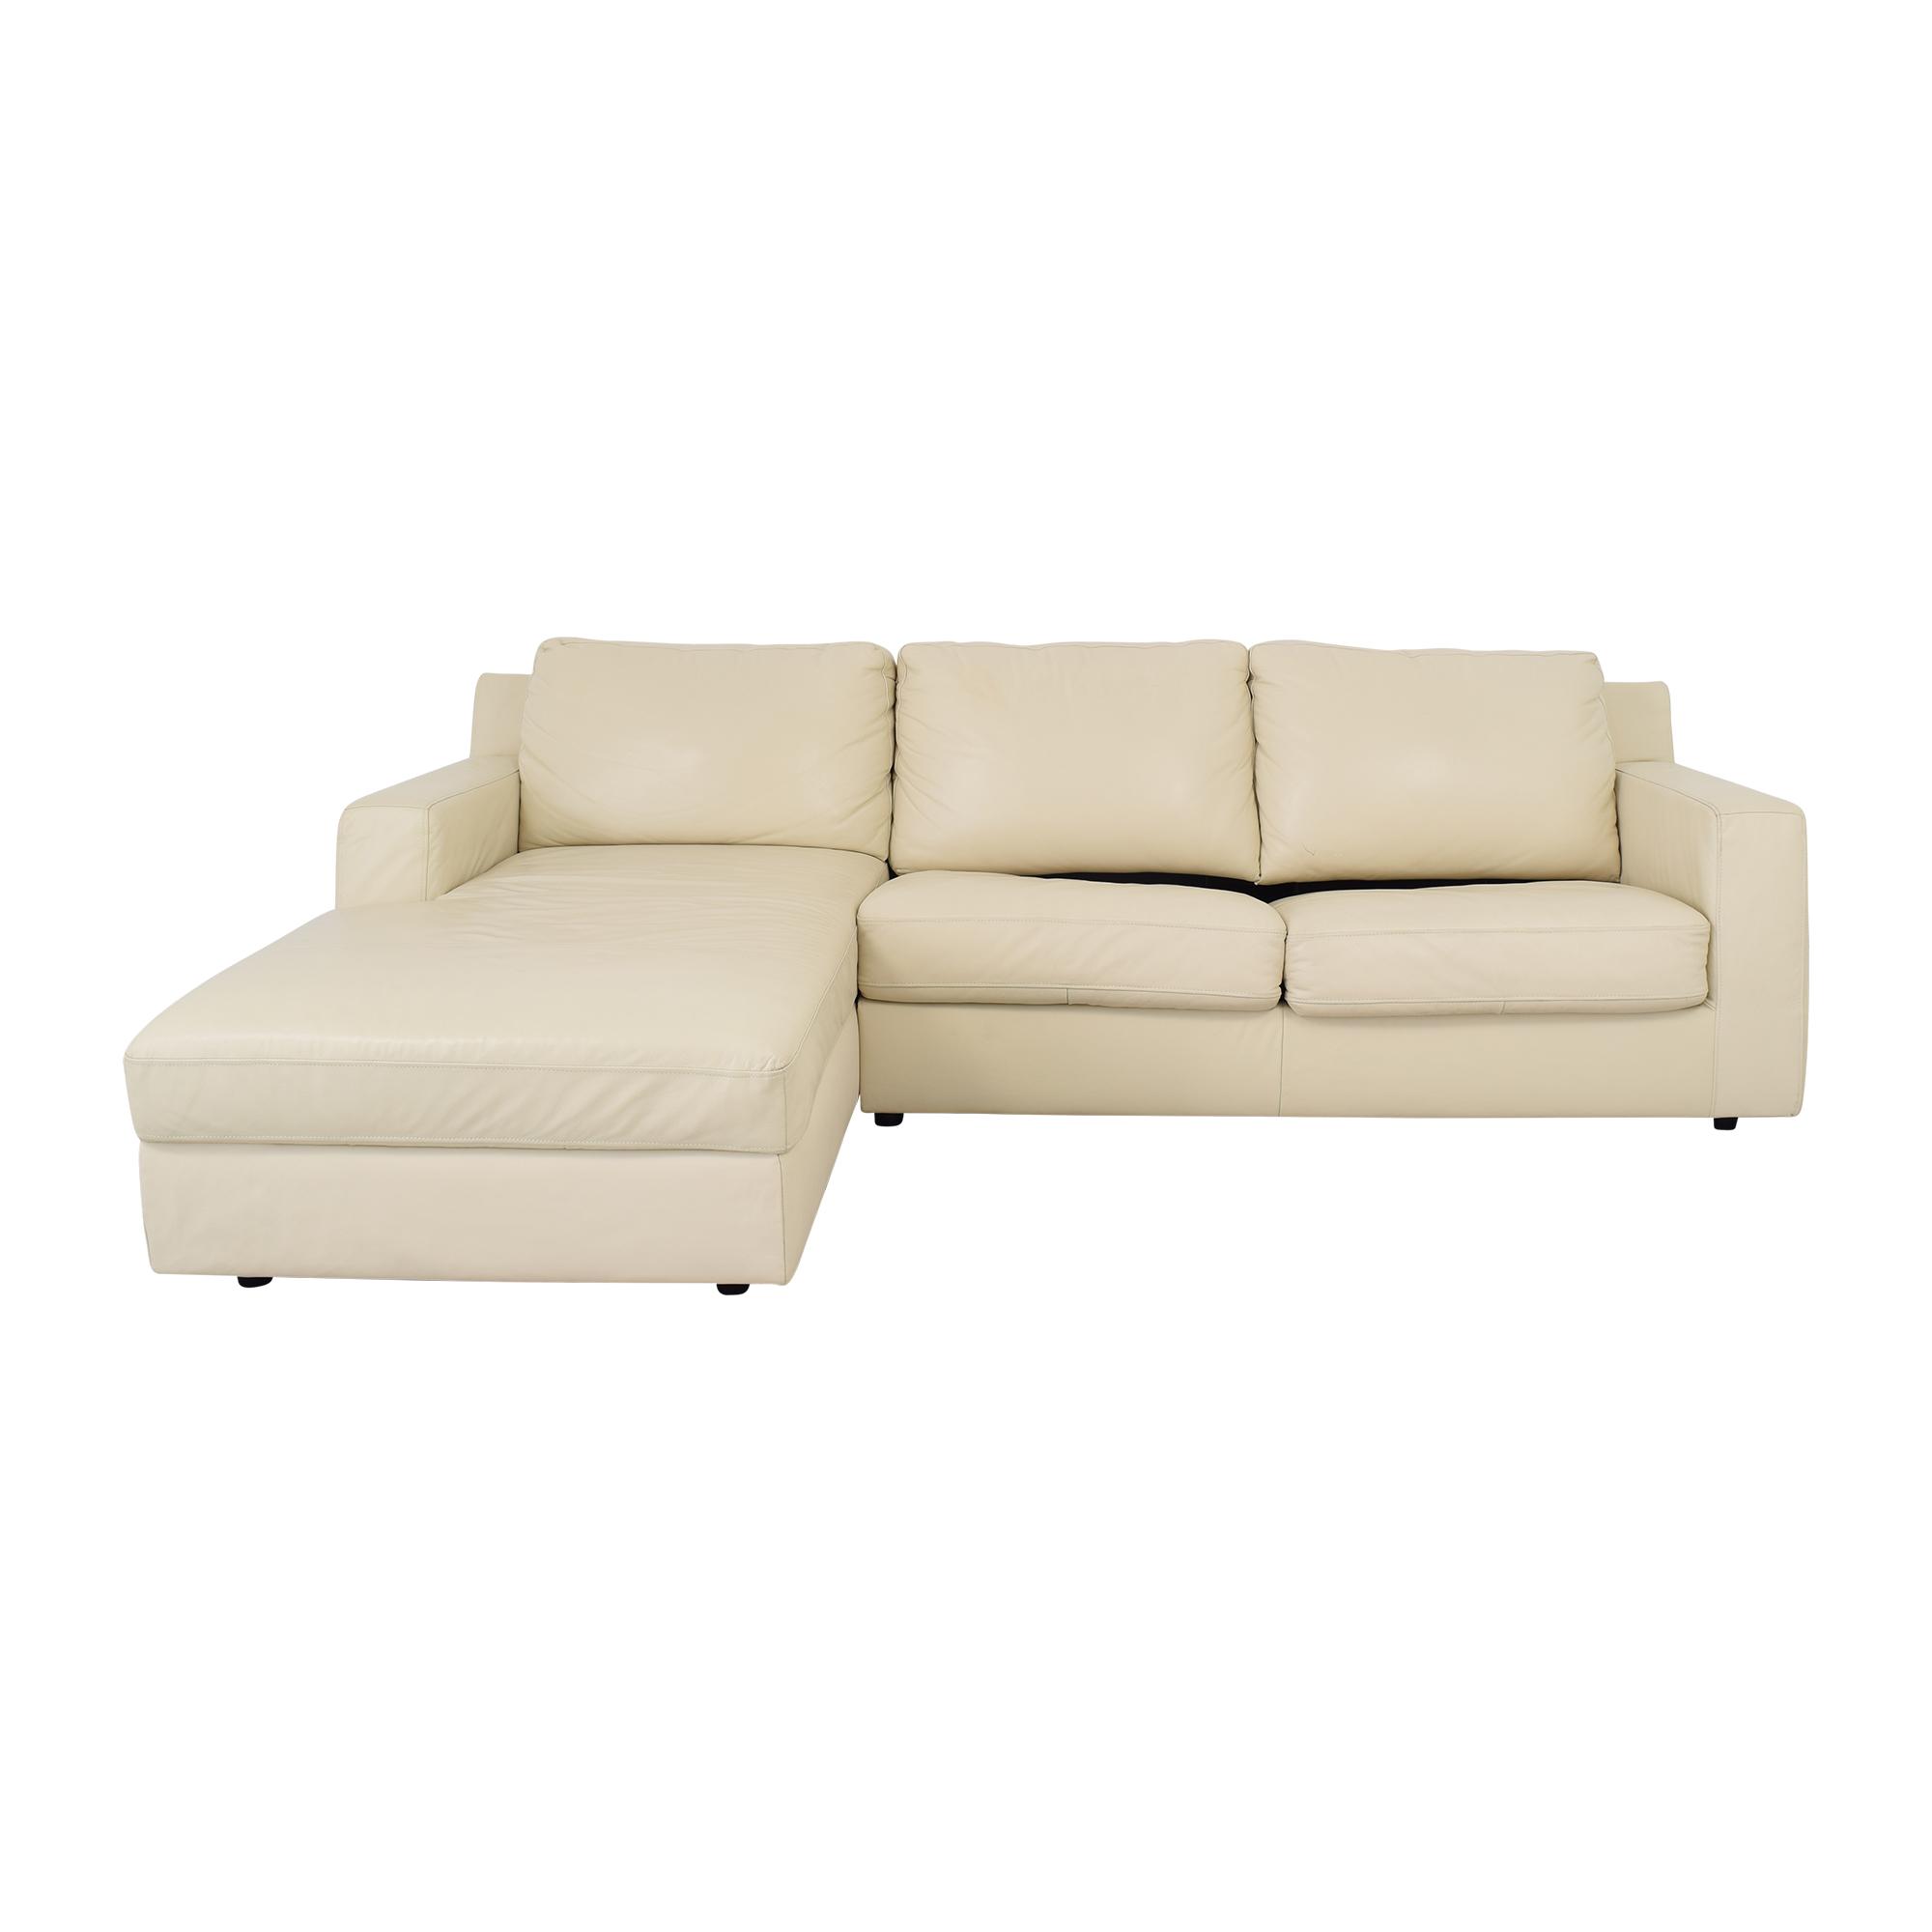 J&M Furniture Jenny Sectional Sleeper Sofa J&M Furniture